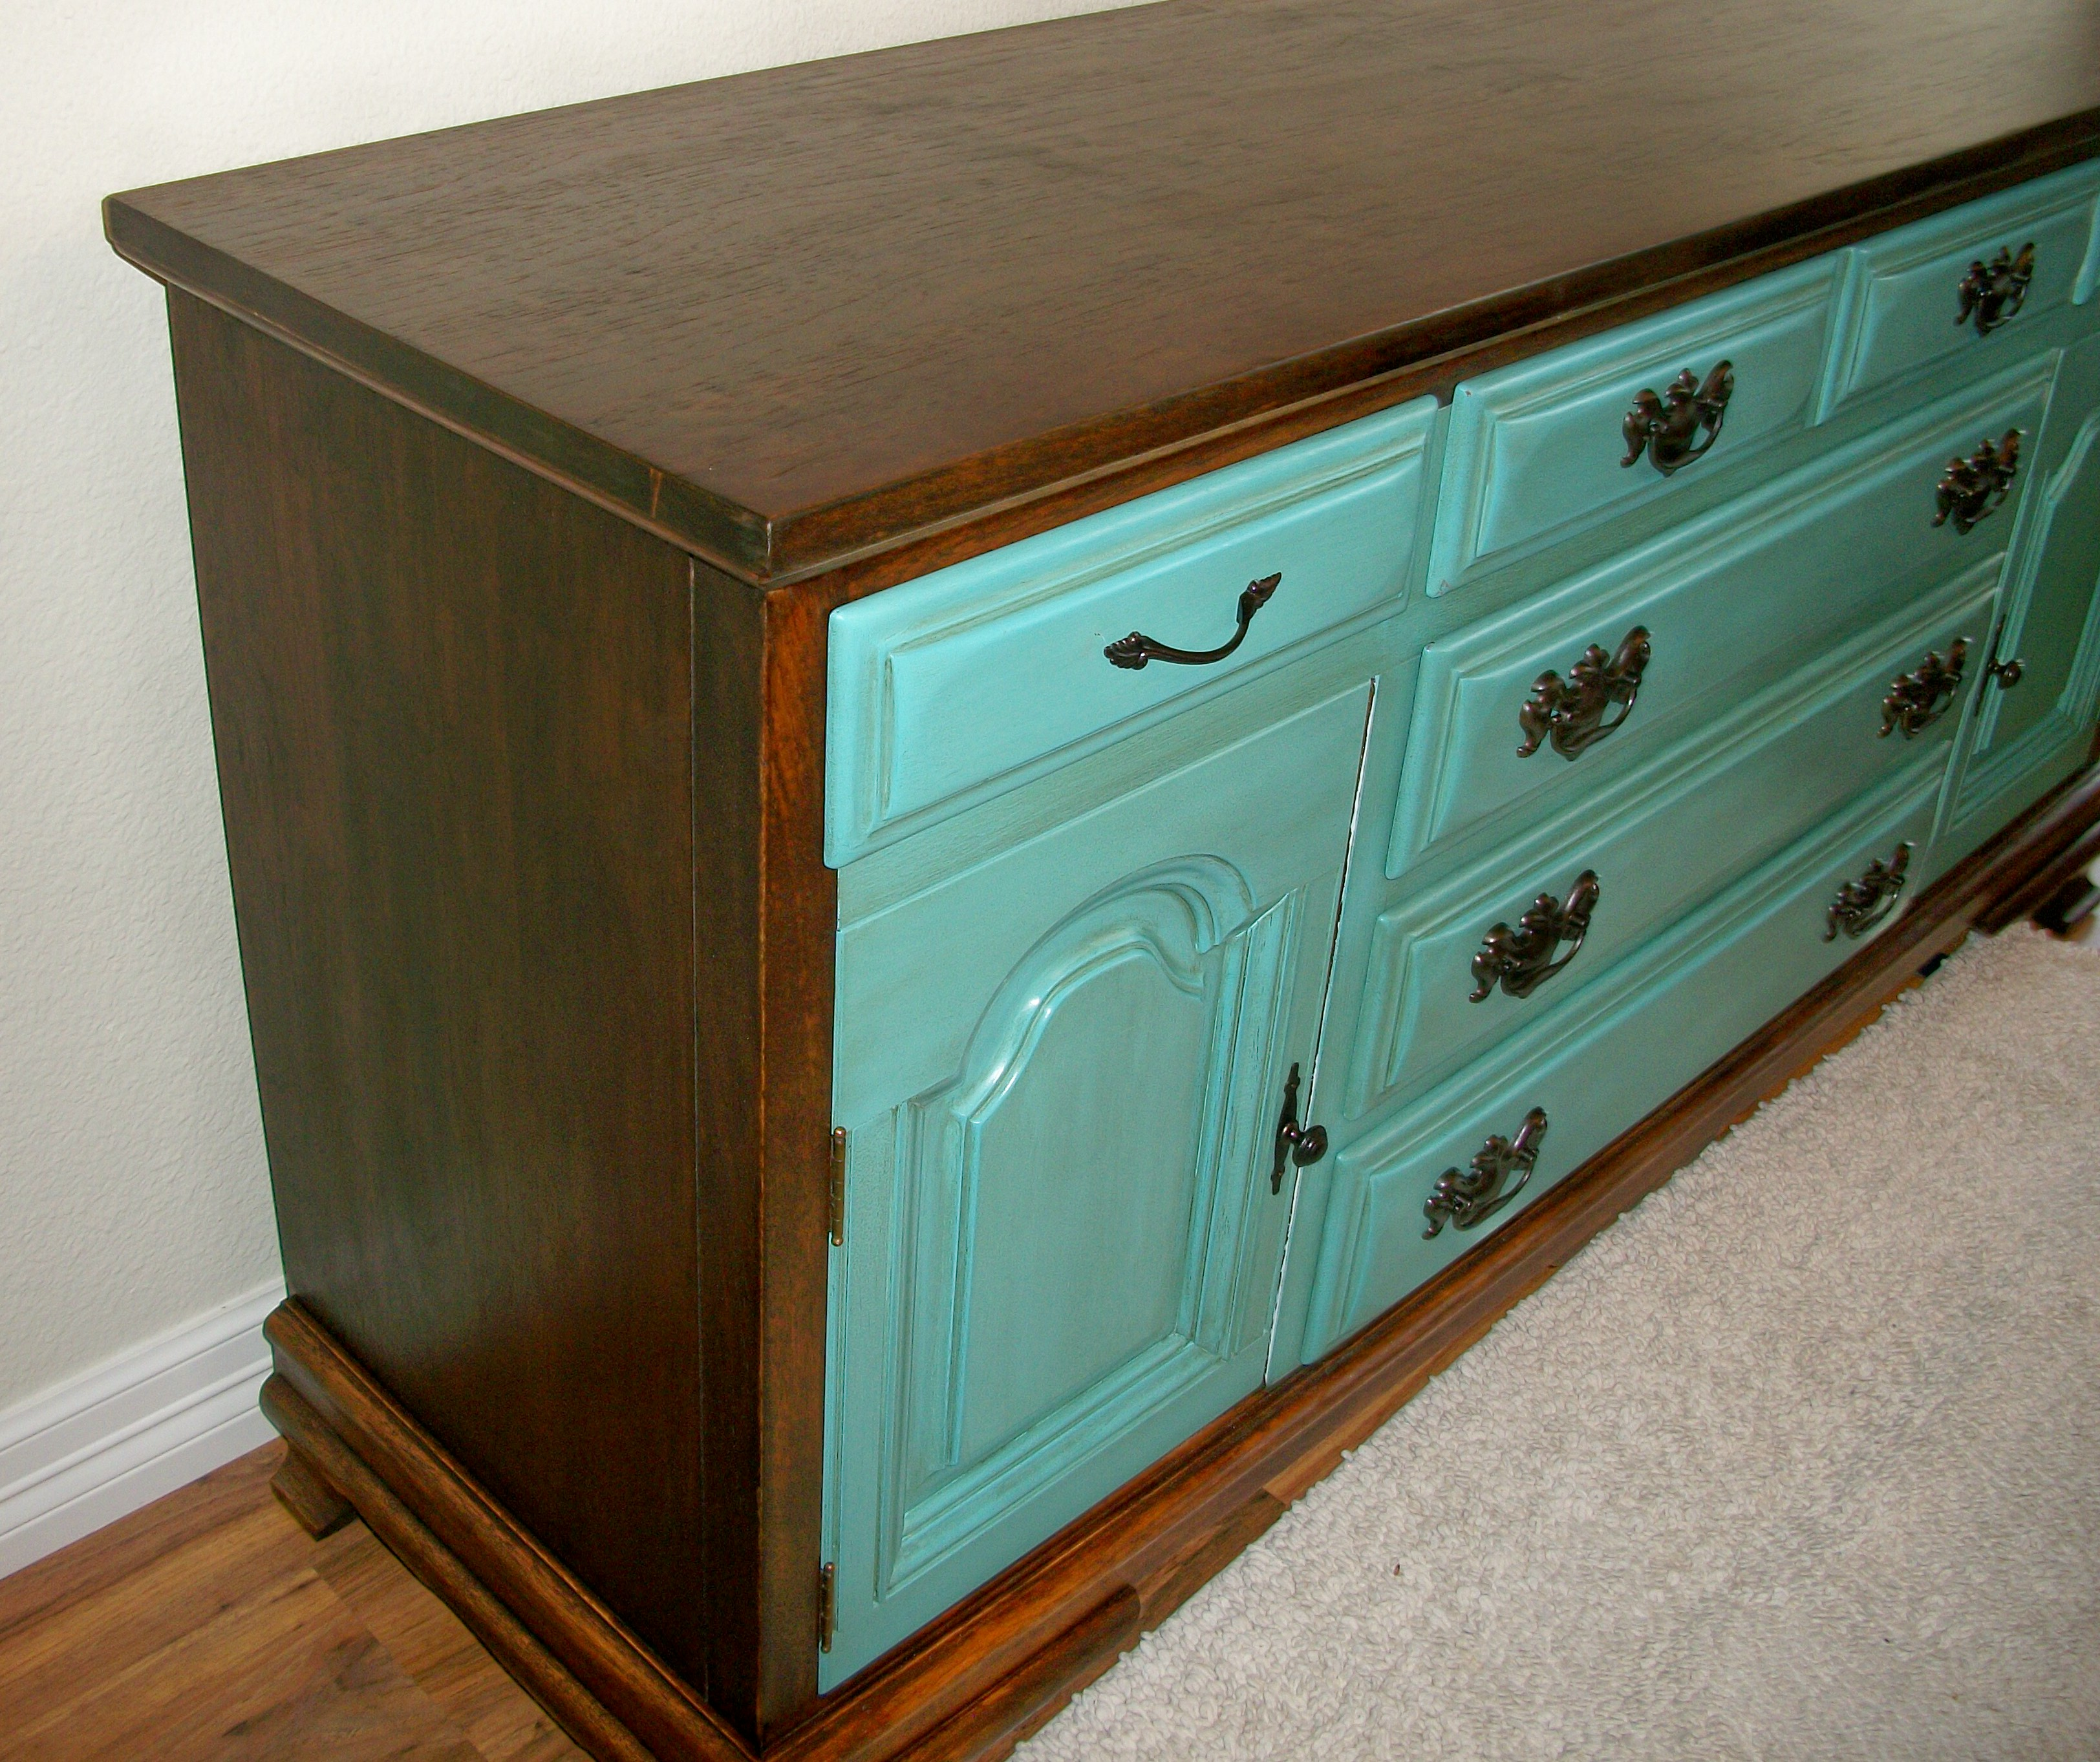 Furniturefriday Hand Painted Furniture